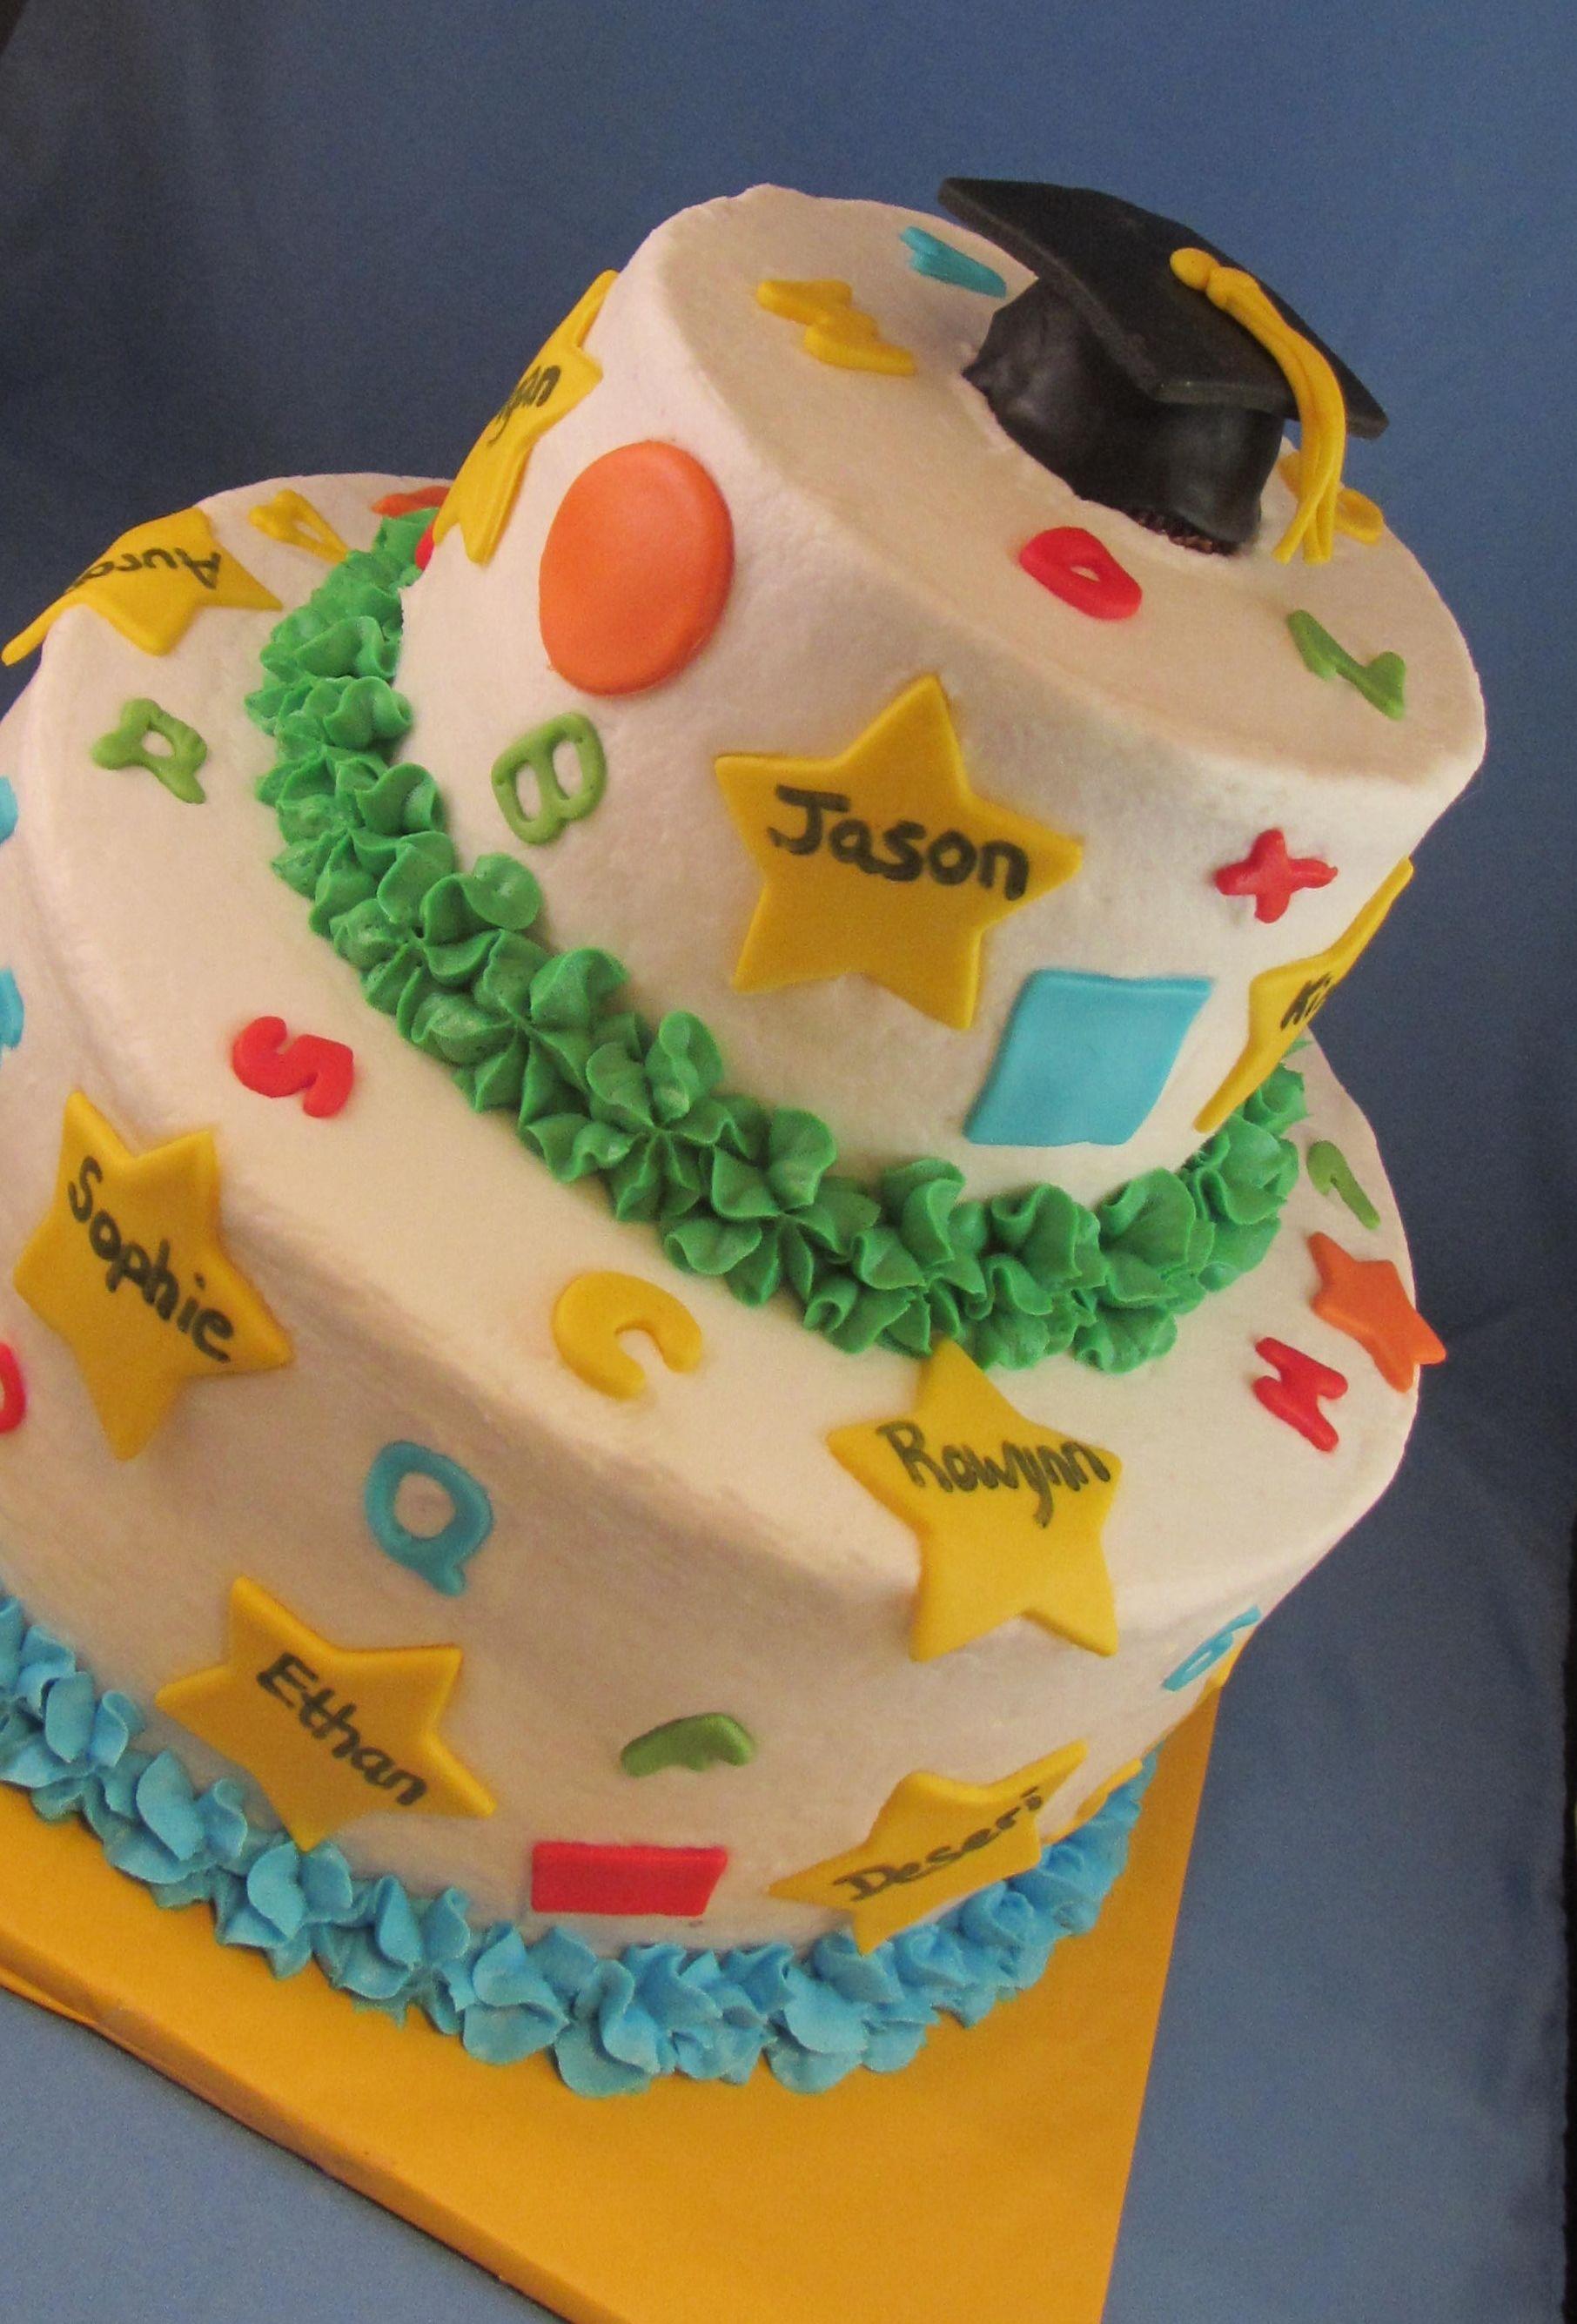 Pre School Graduation Cake Cute With All The Kids Names Preschool